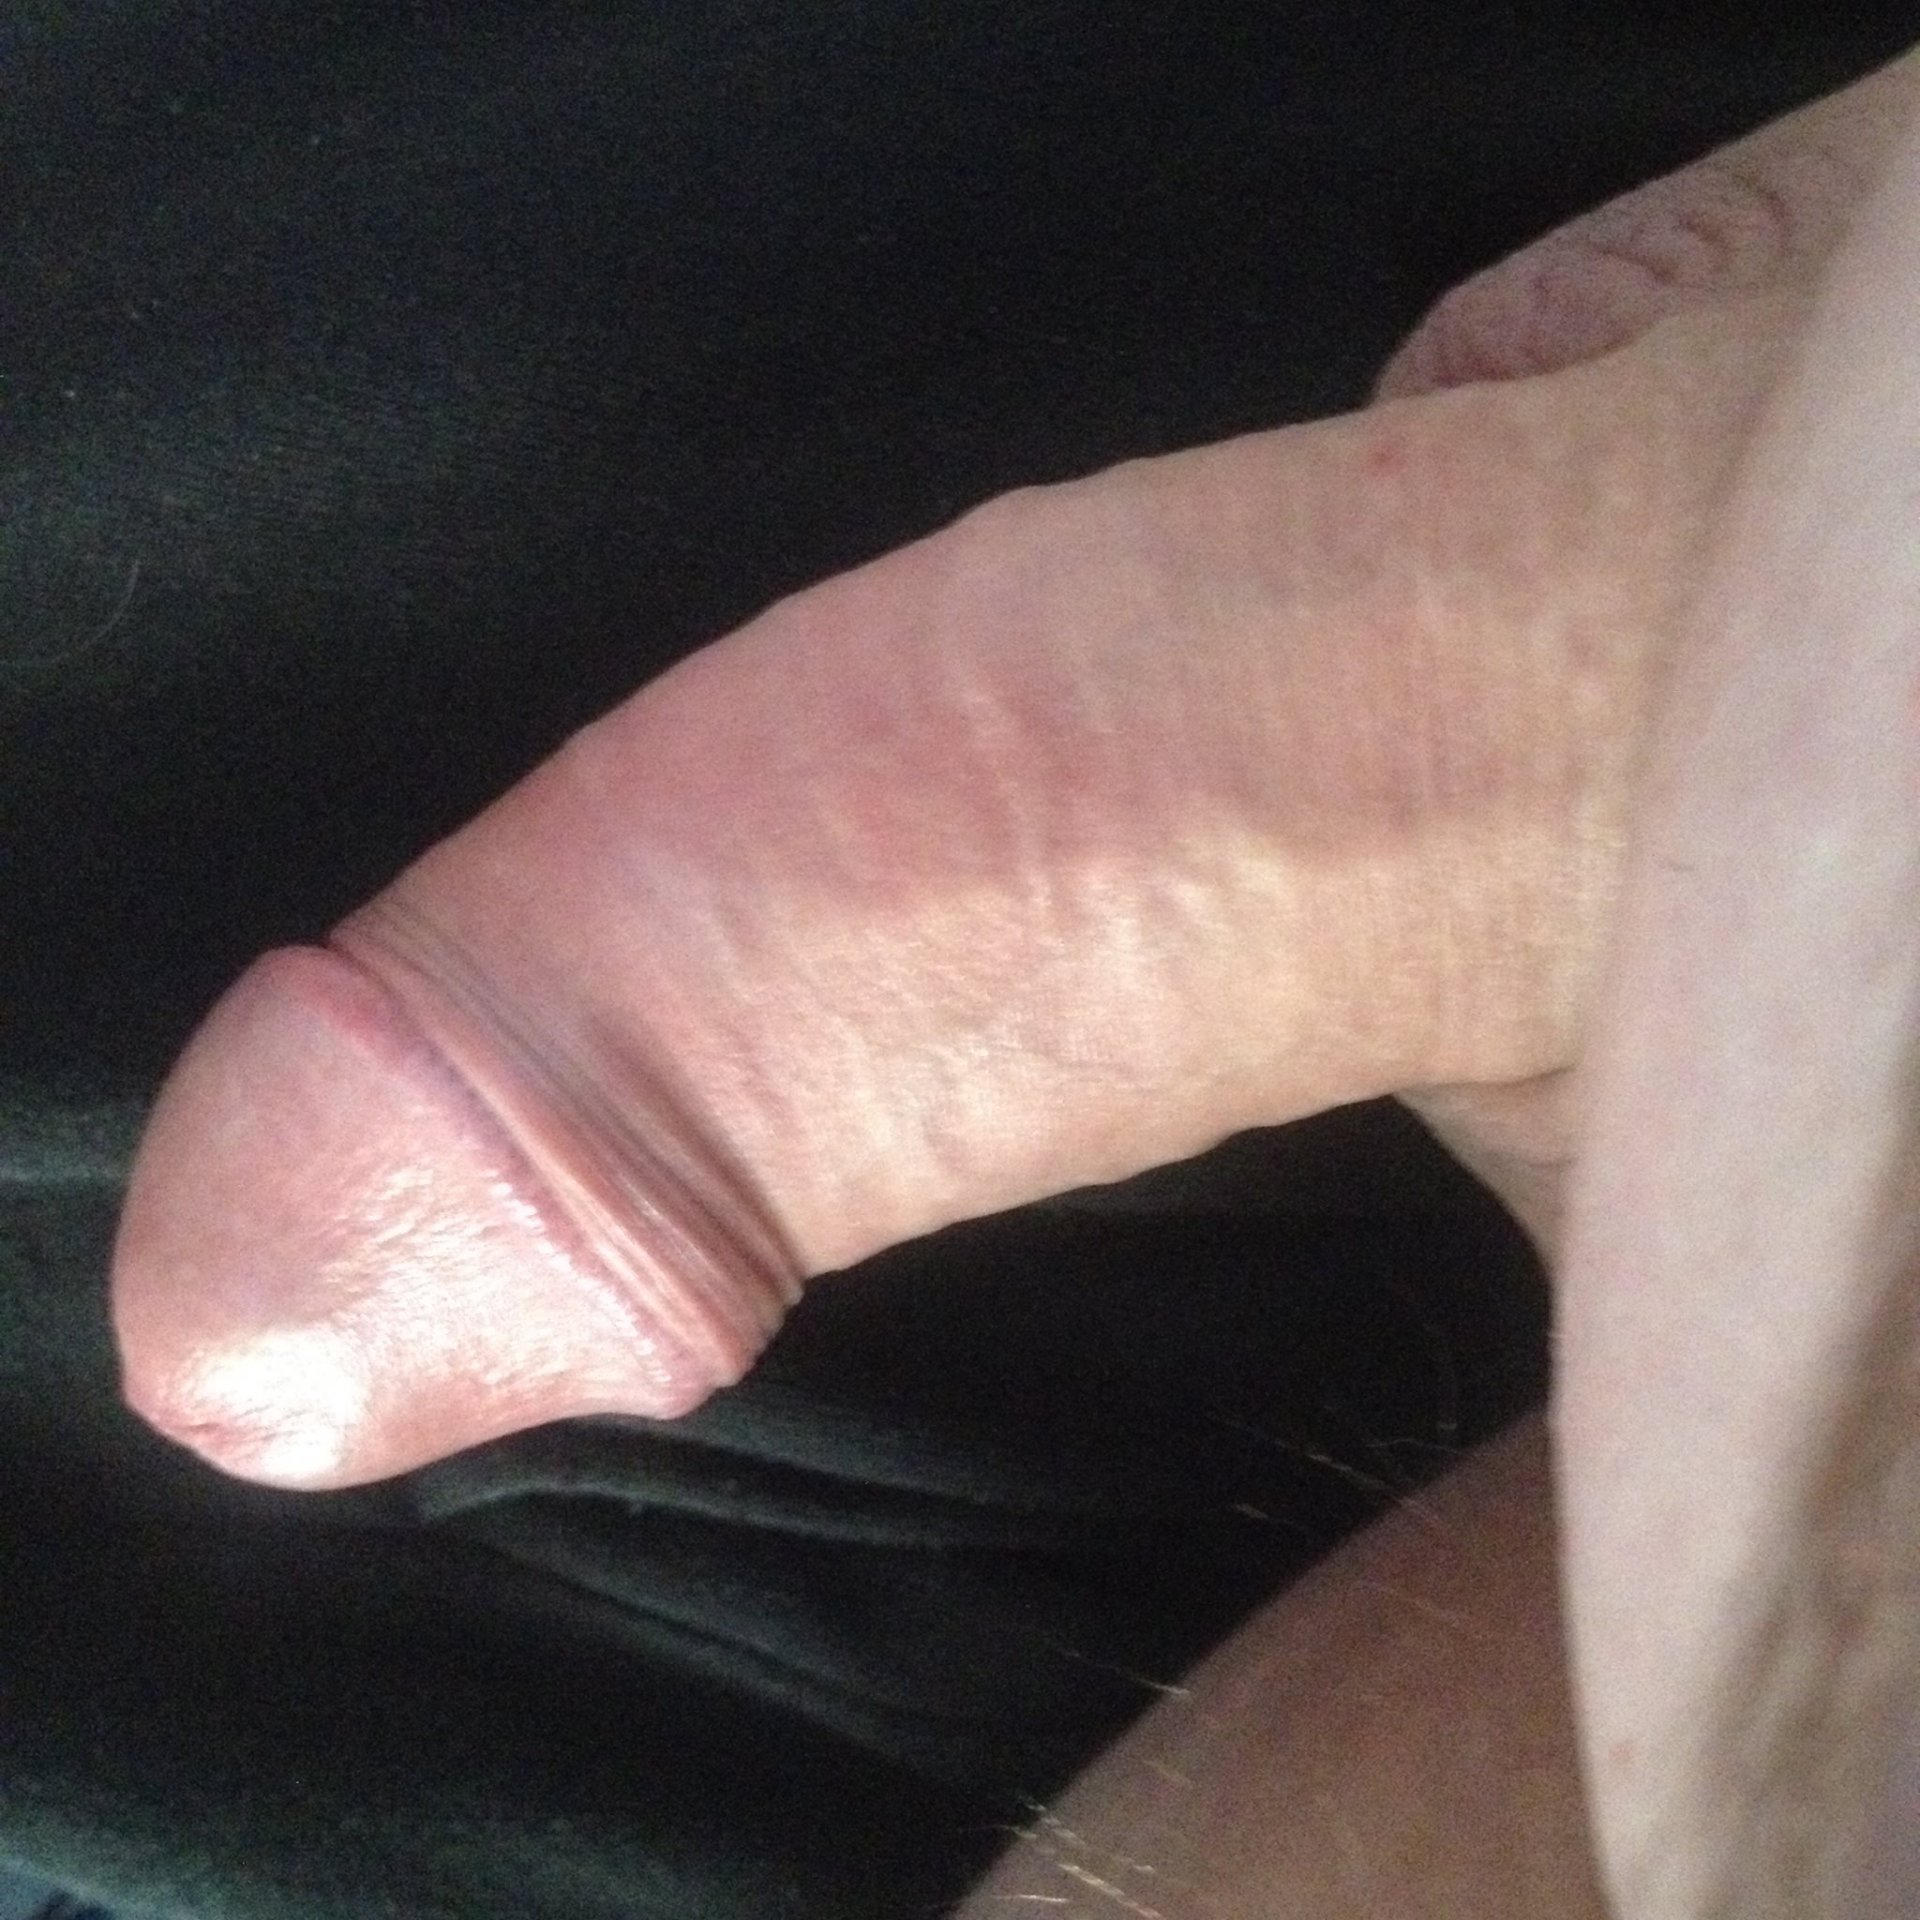 Master54uk from Newport,United Kingdom